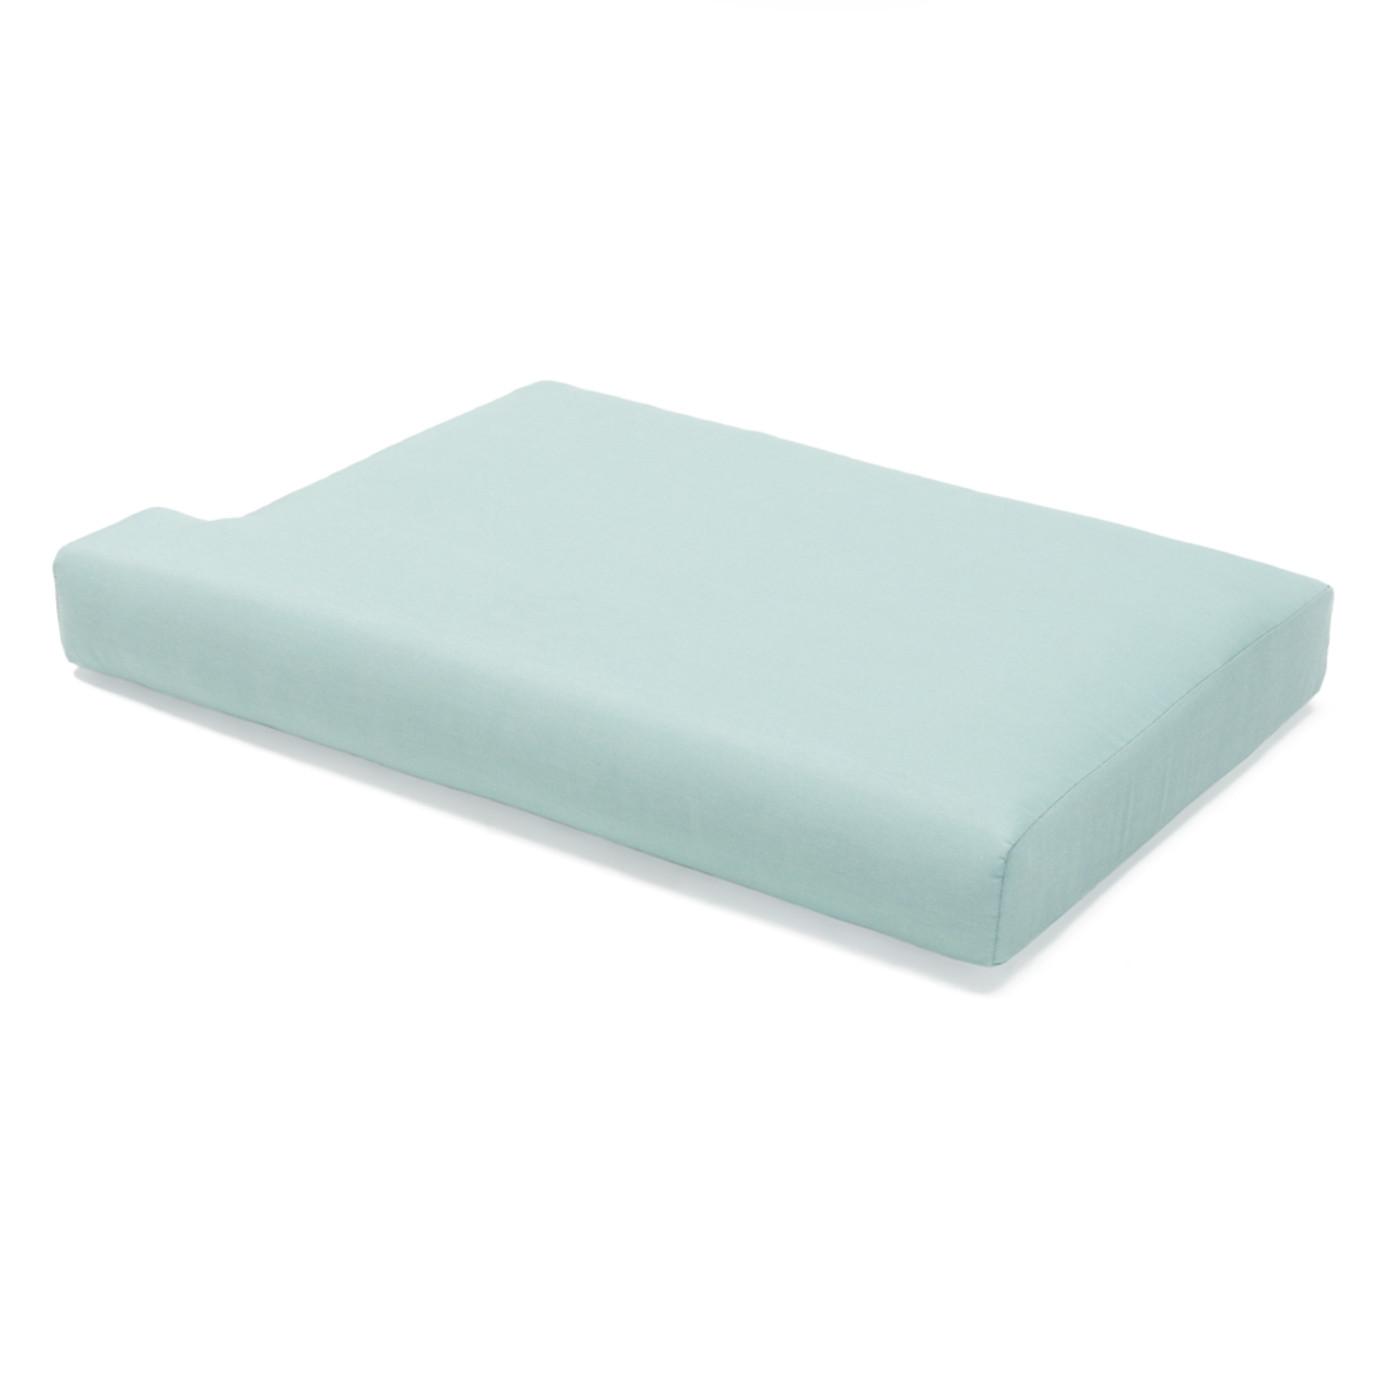 Portofino Casual 88in Sofa Right Base Cushion - Spa Blue